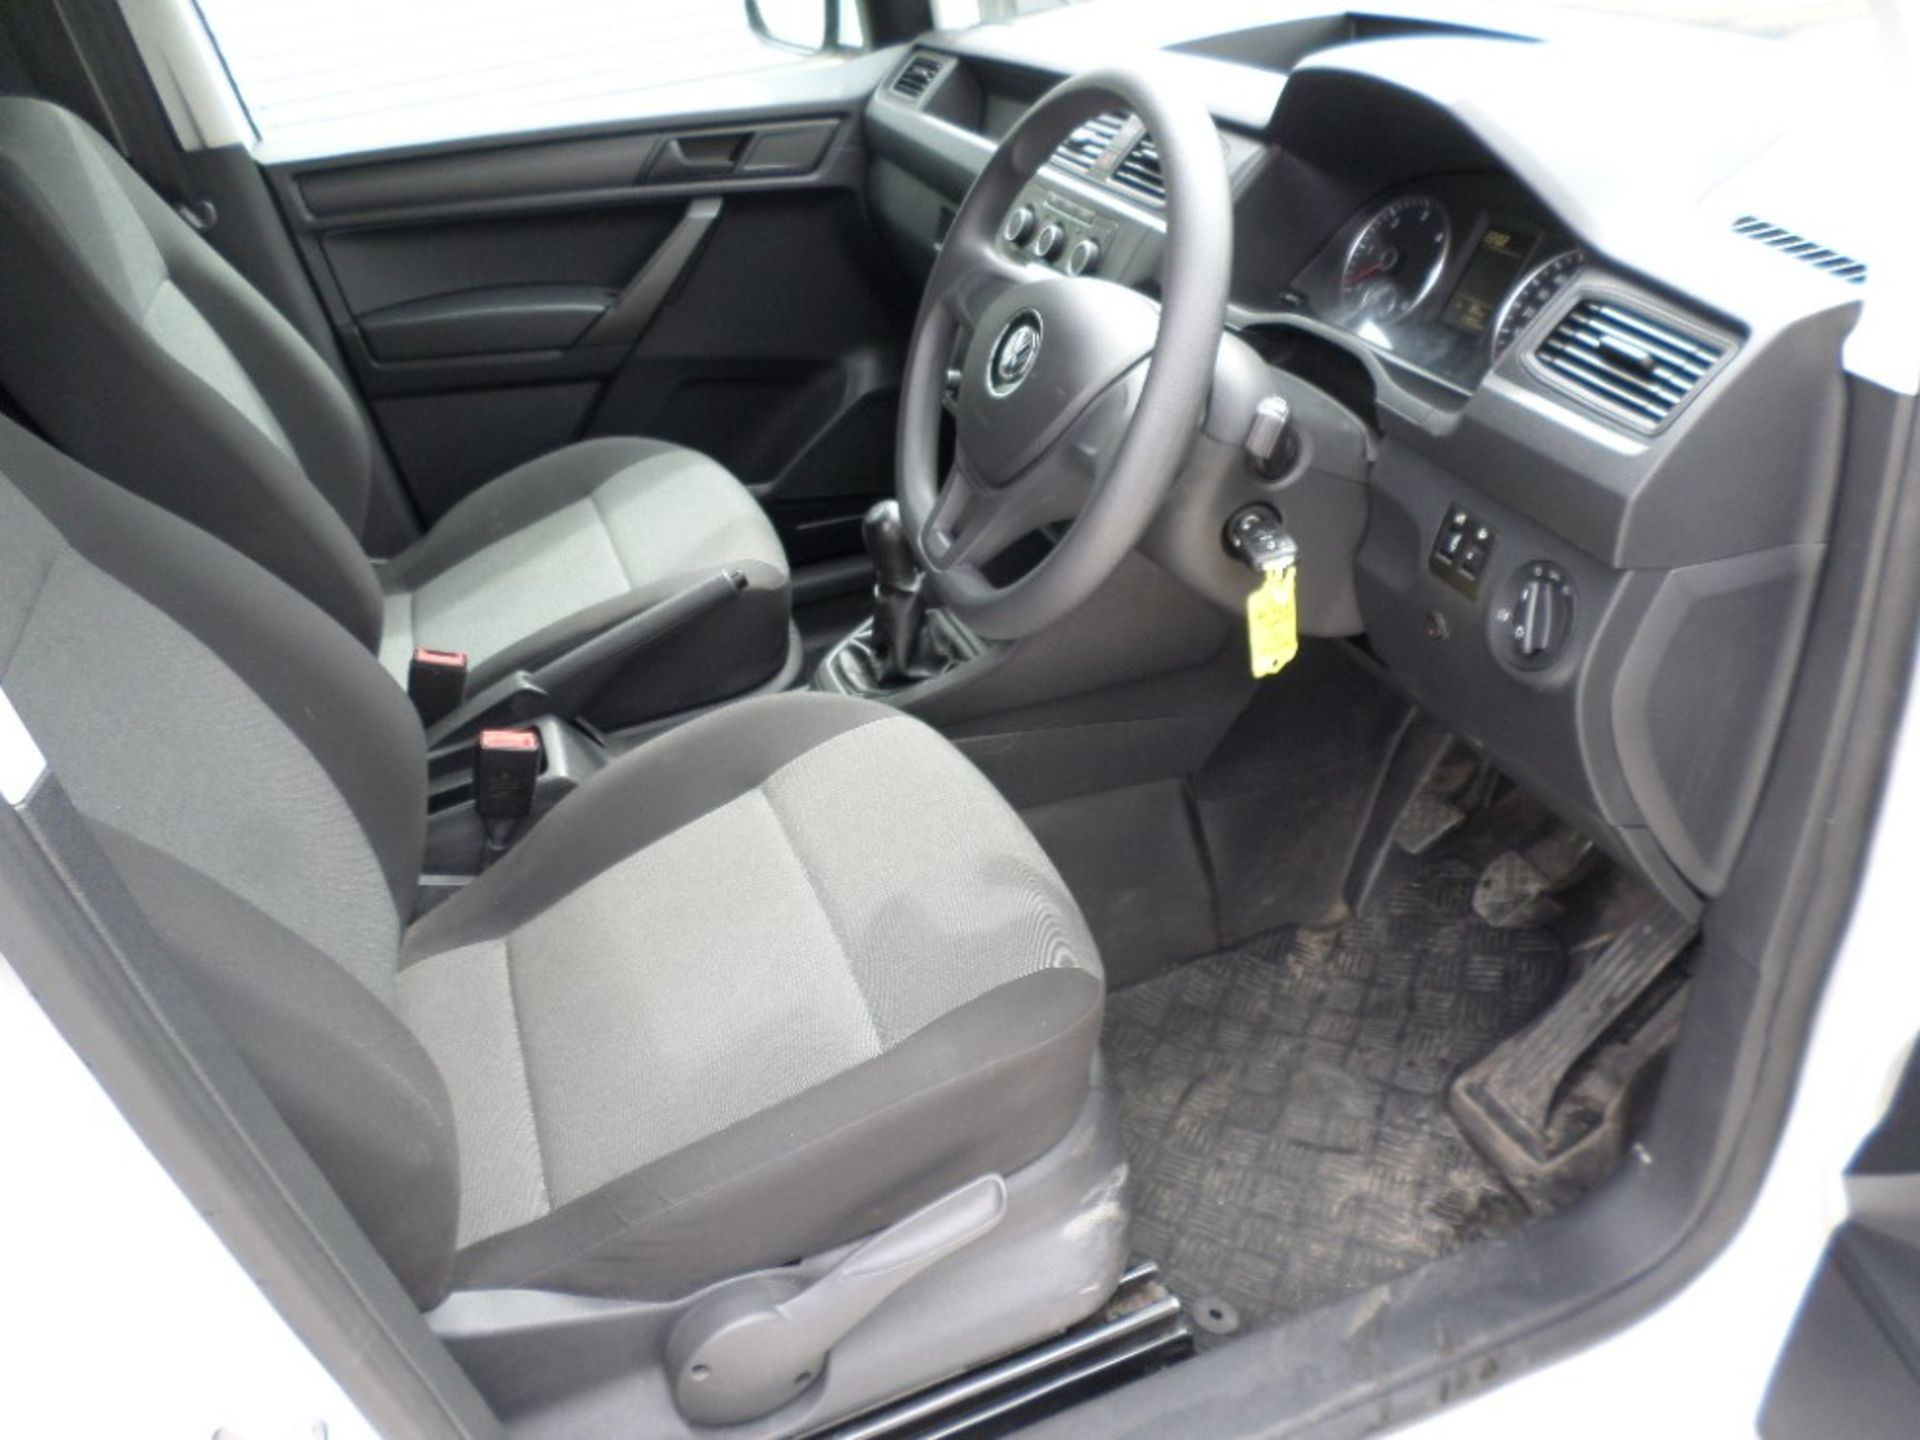 66 reg VW CADDY 2.0 TDI C20 STARTLINE (LOCATION SHEFFIELD) 11955M, V5 HERE, 1 FORMER KEEPER (ON VCAR - Image 6 of 6